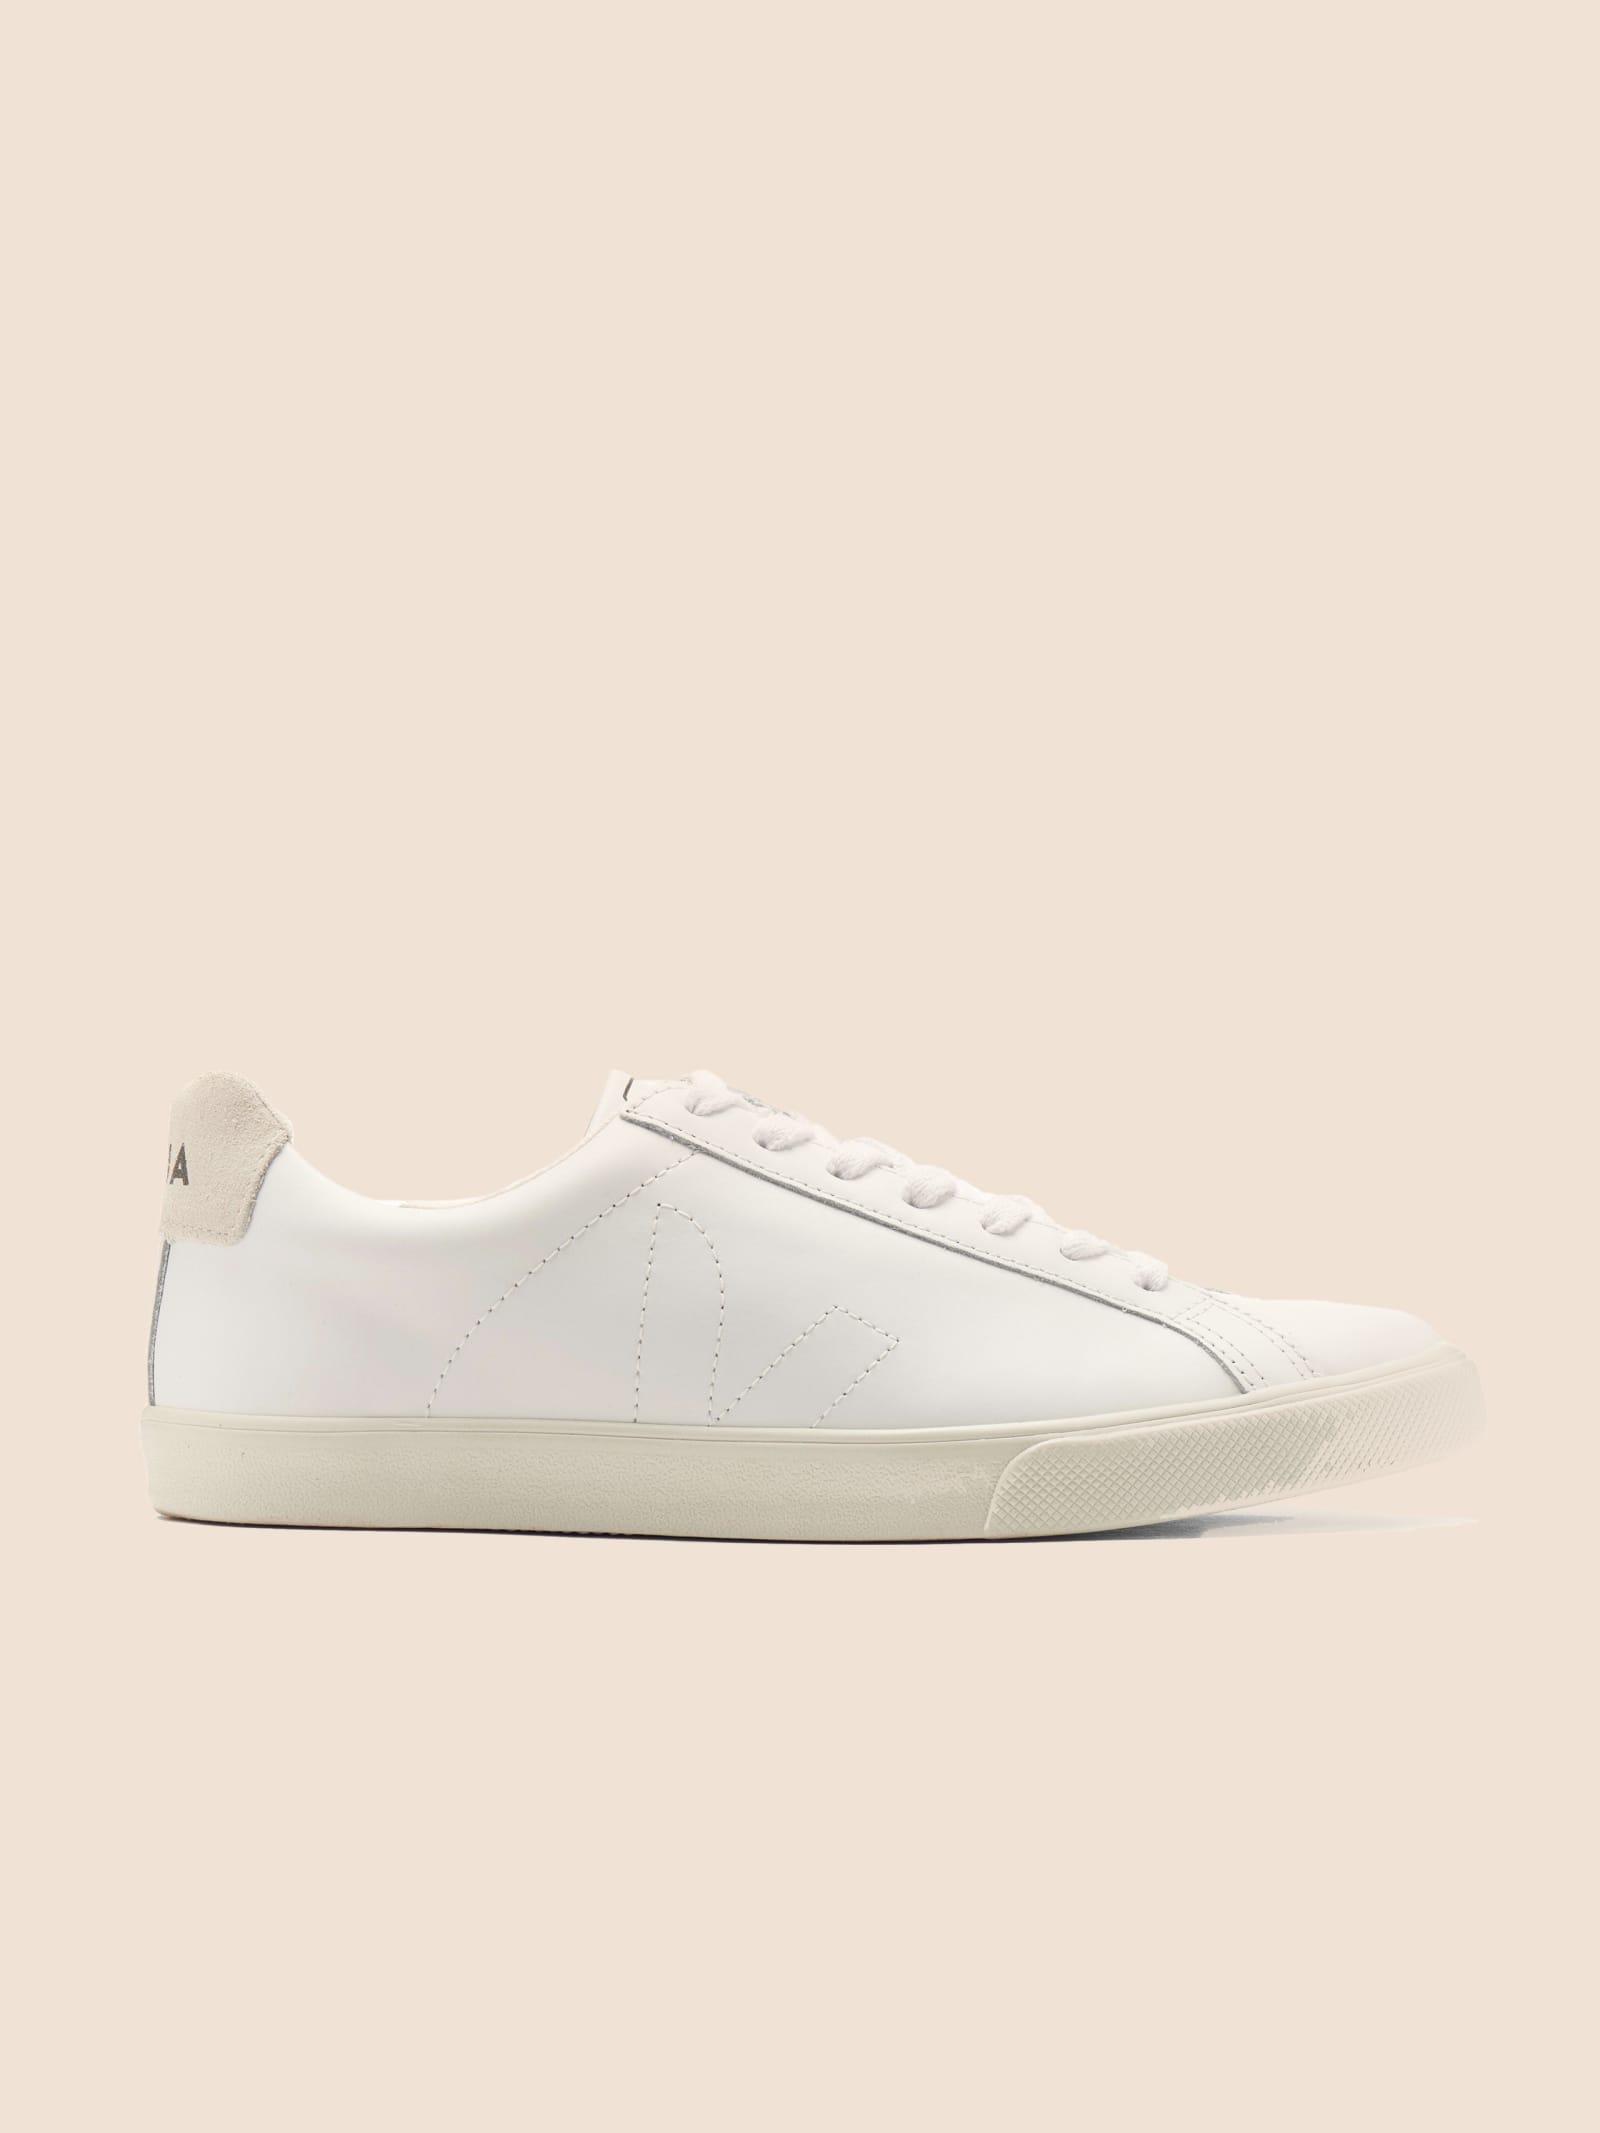 Veja Esplar Leather Sneaker | Reformation